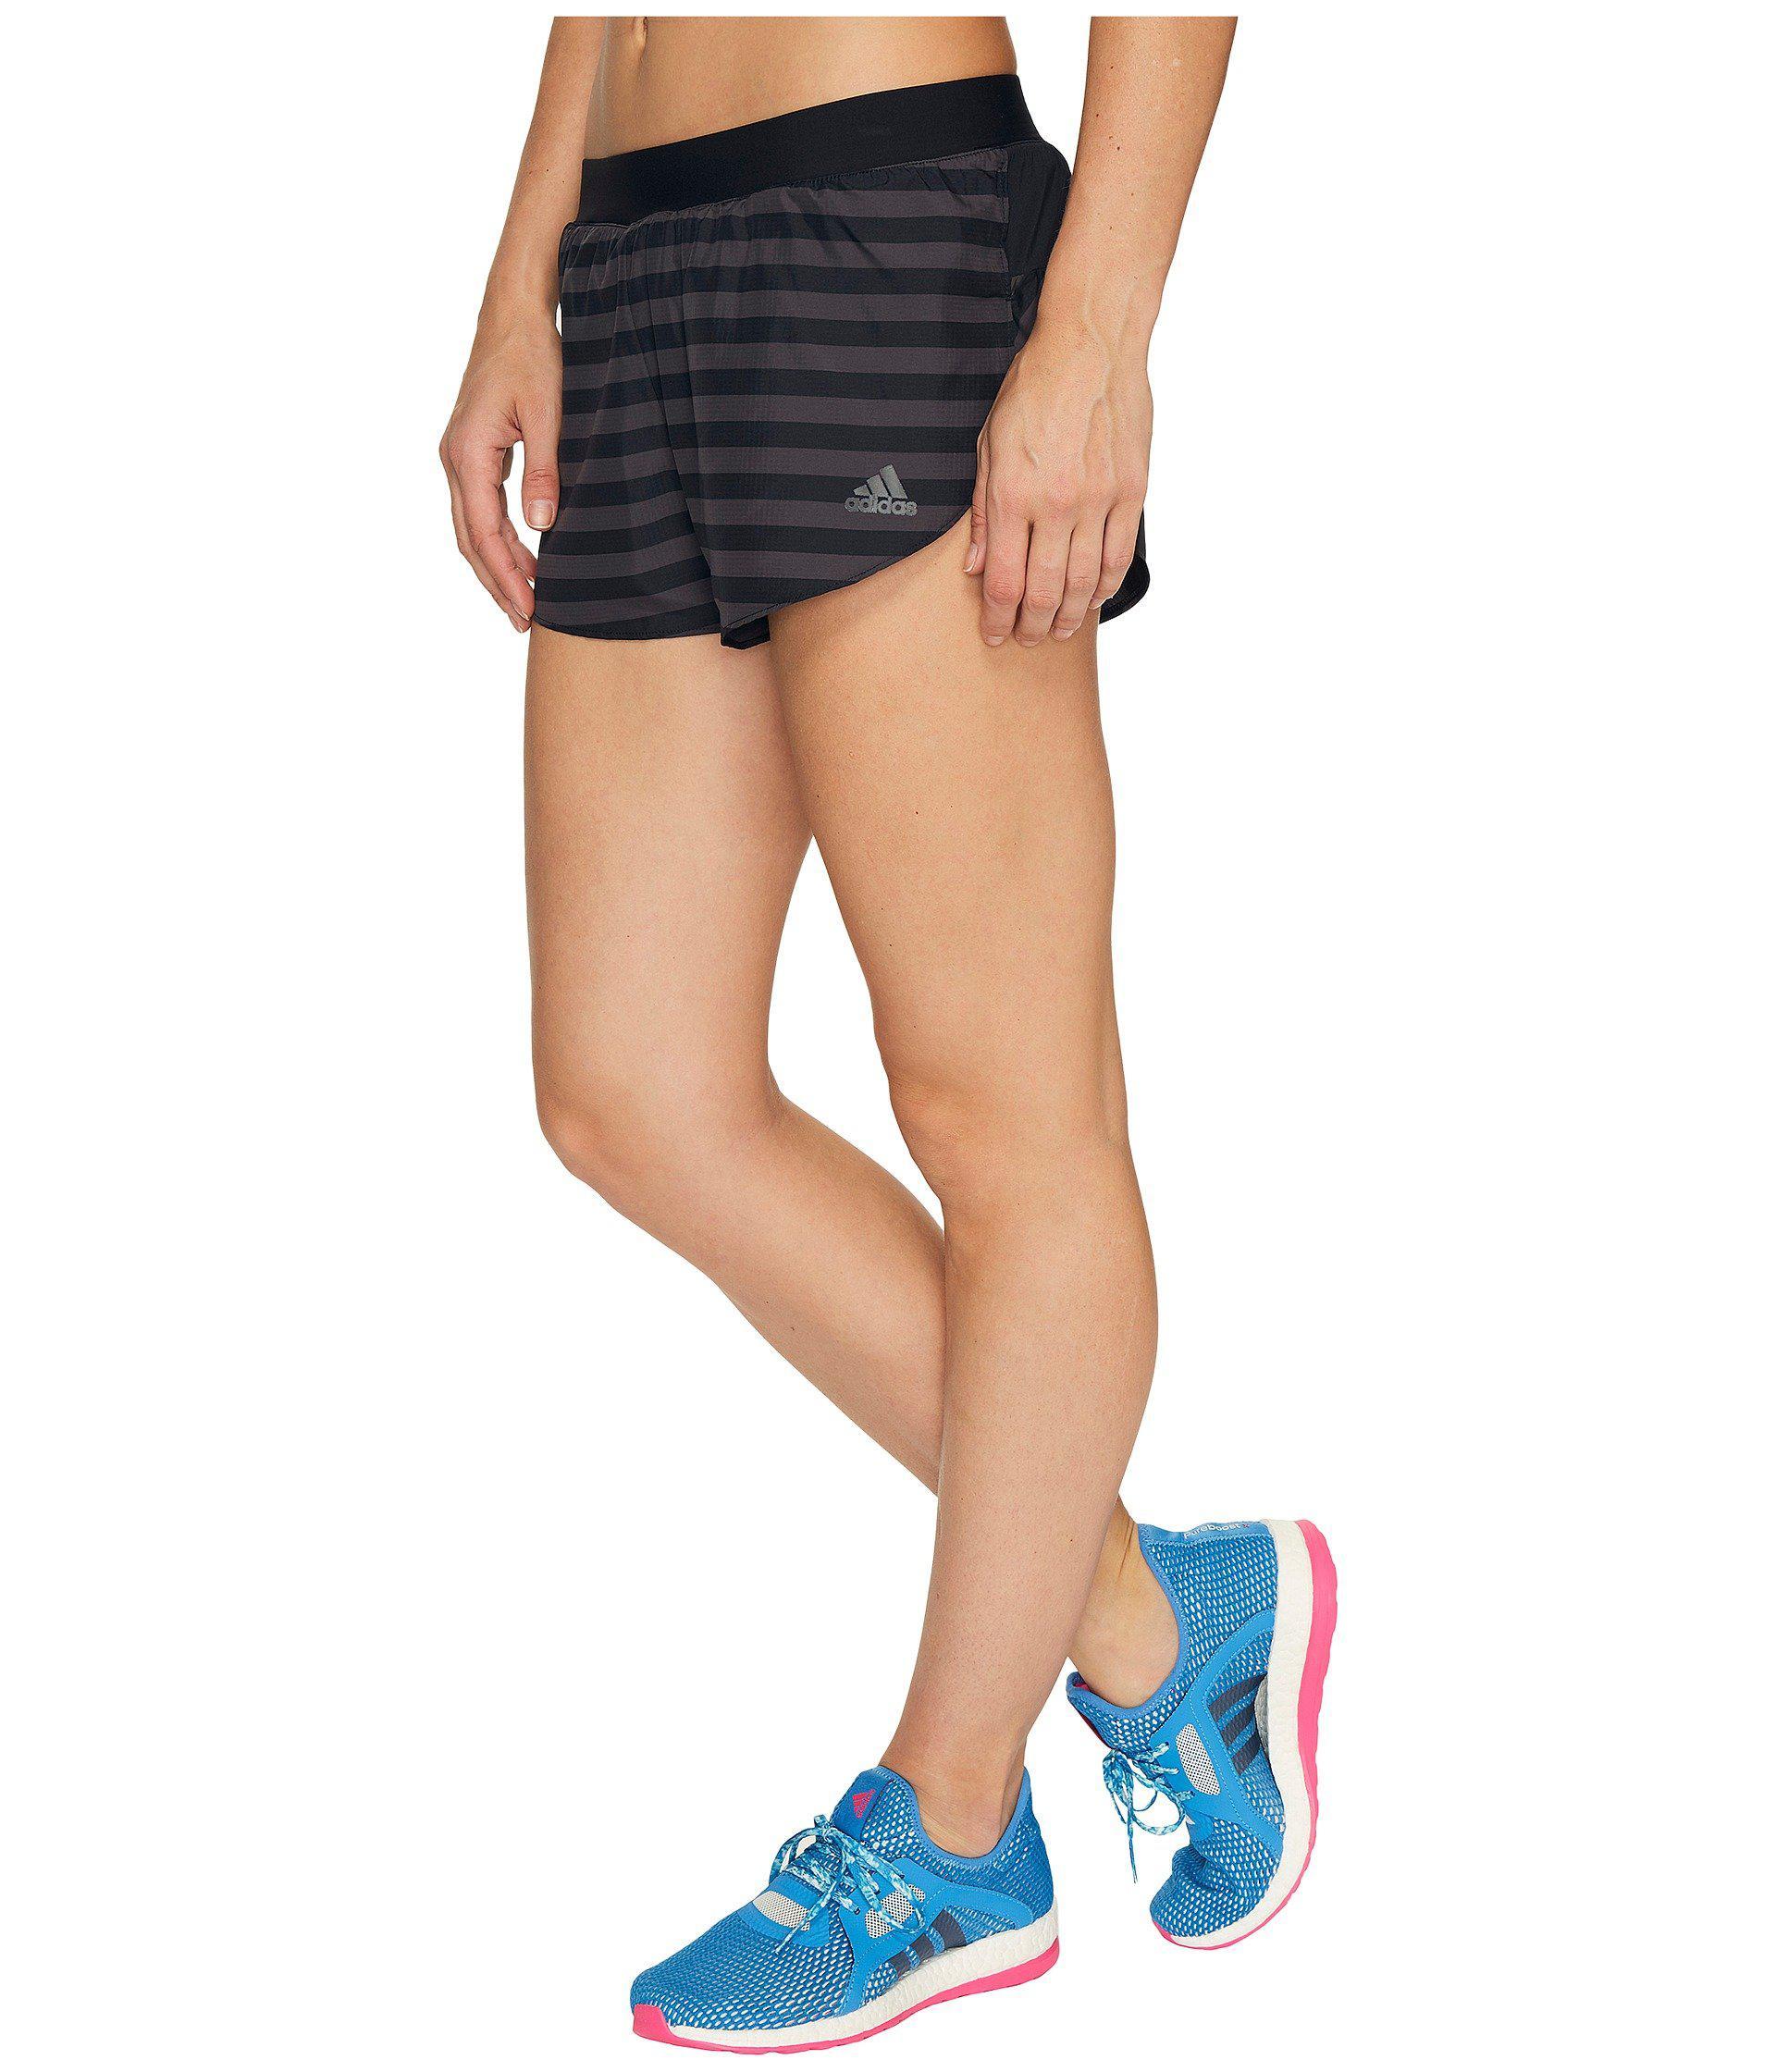 Adidas Split Black Adizero Lyst In Shorts wq4xd7